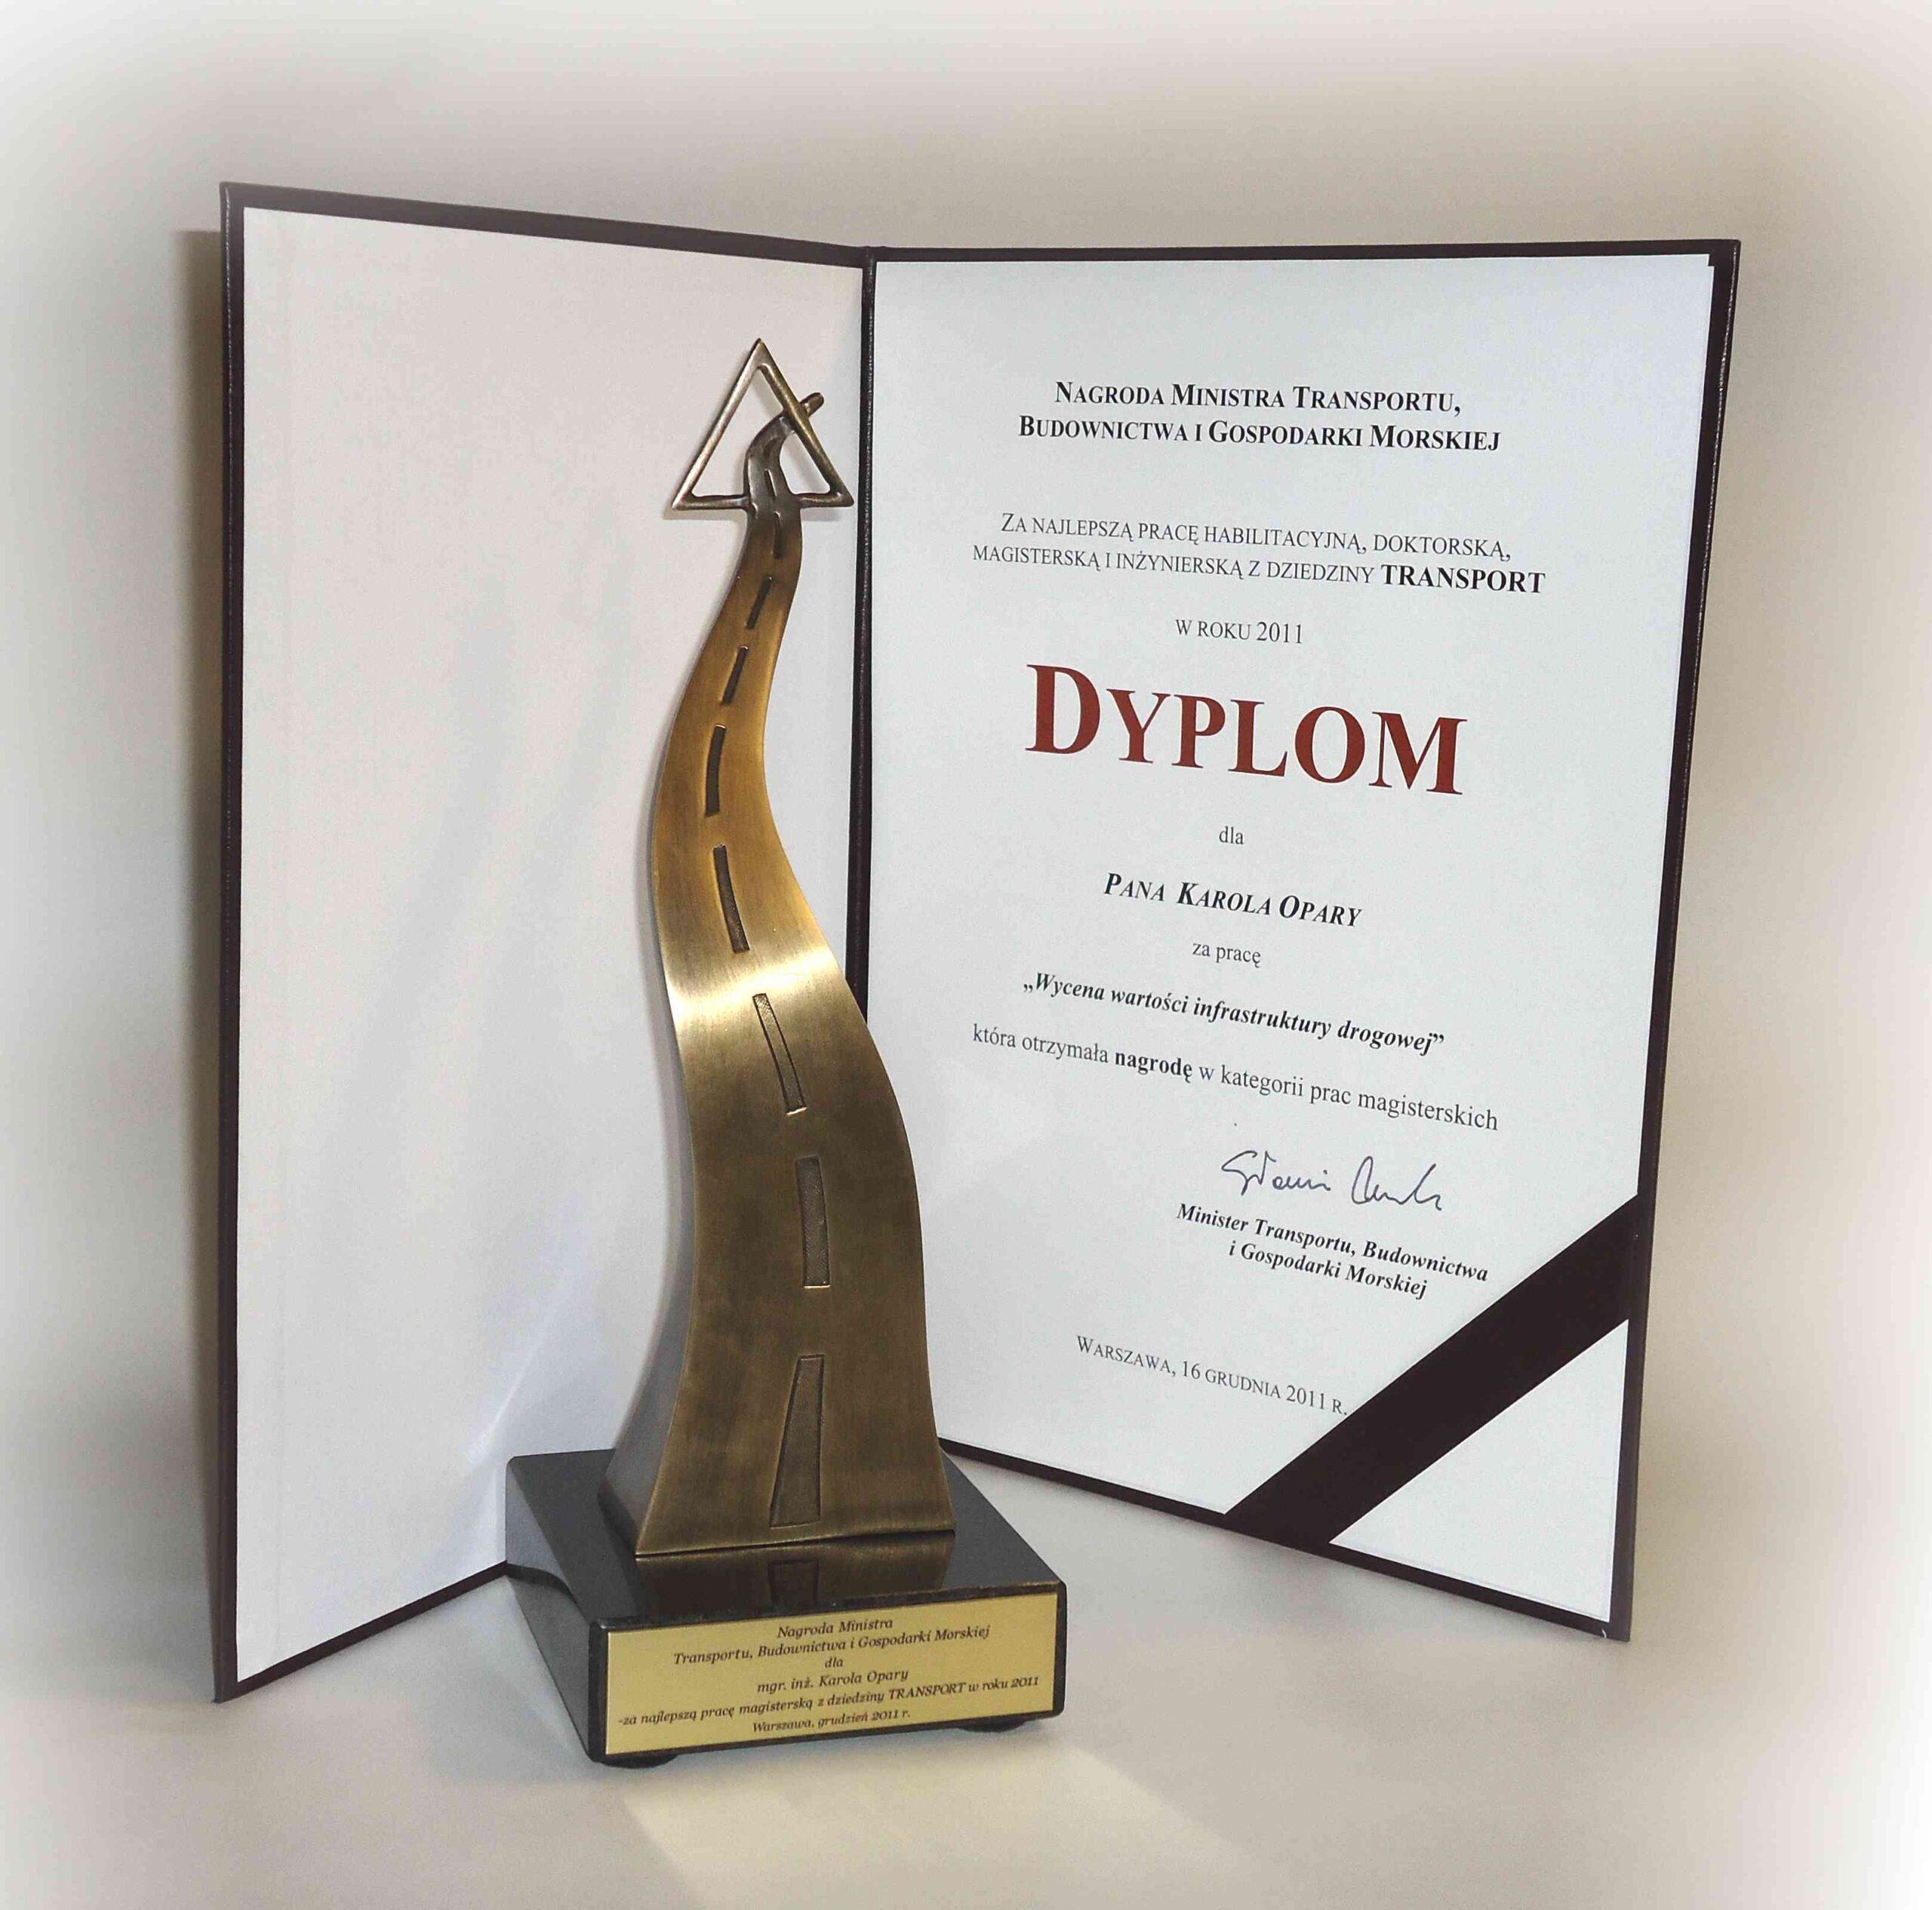 Nagroda Ministra Transportu dla Karola Opary